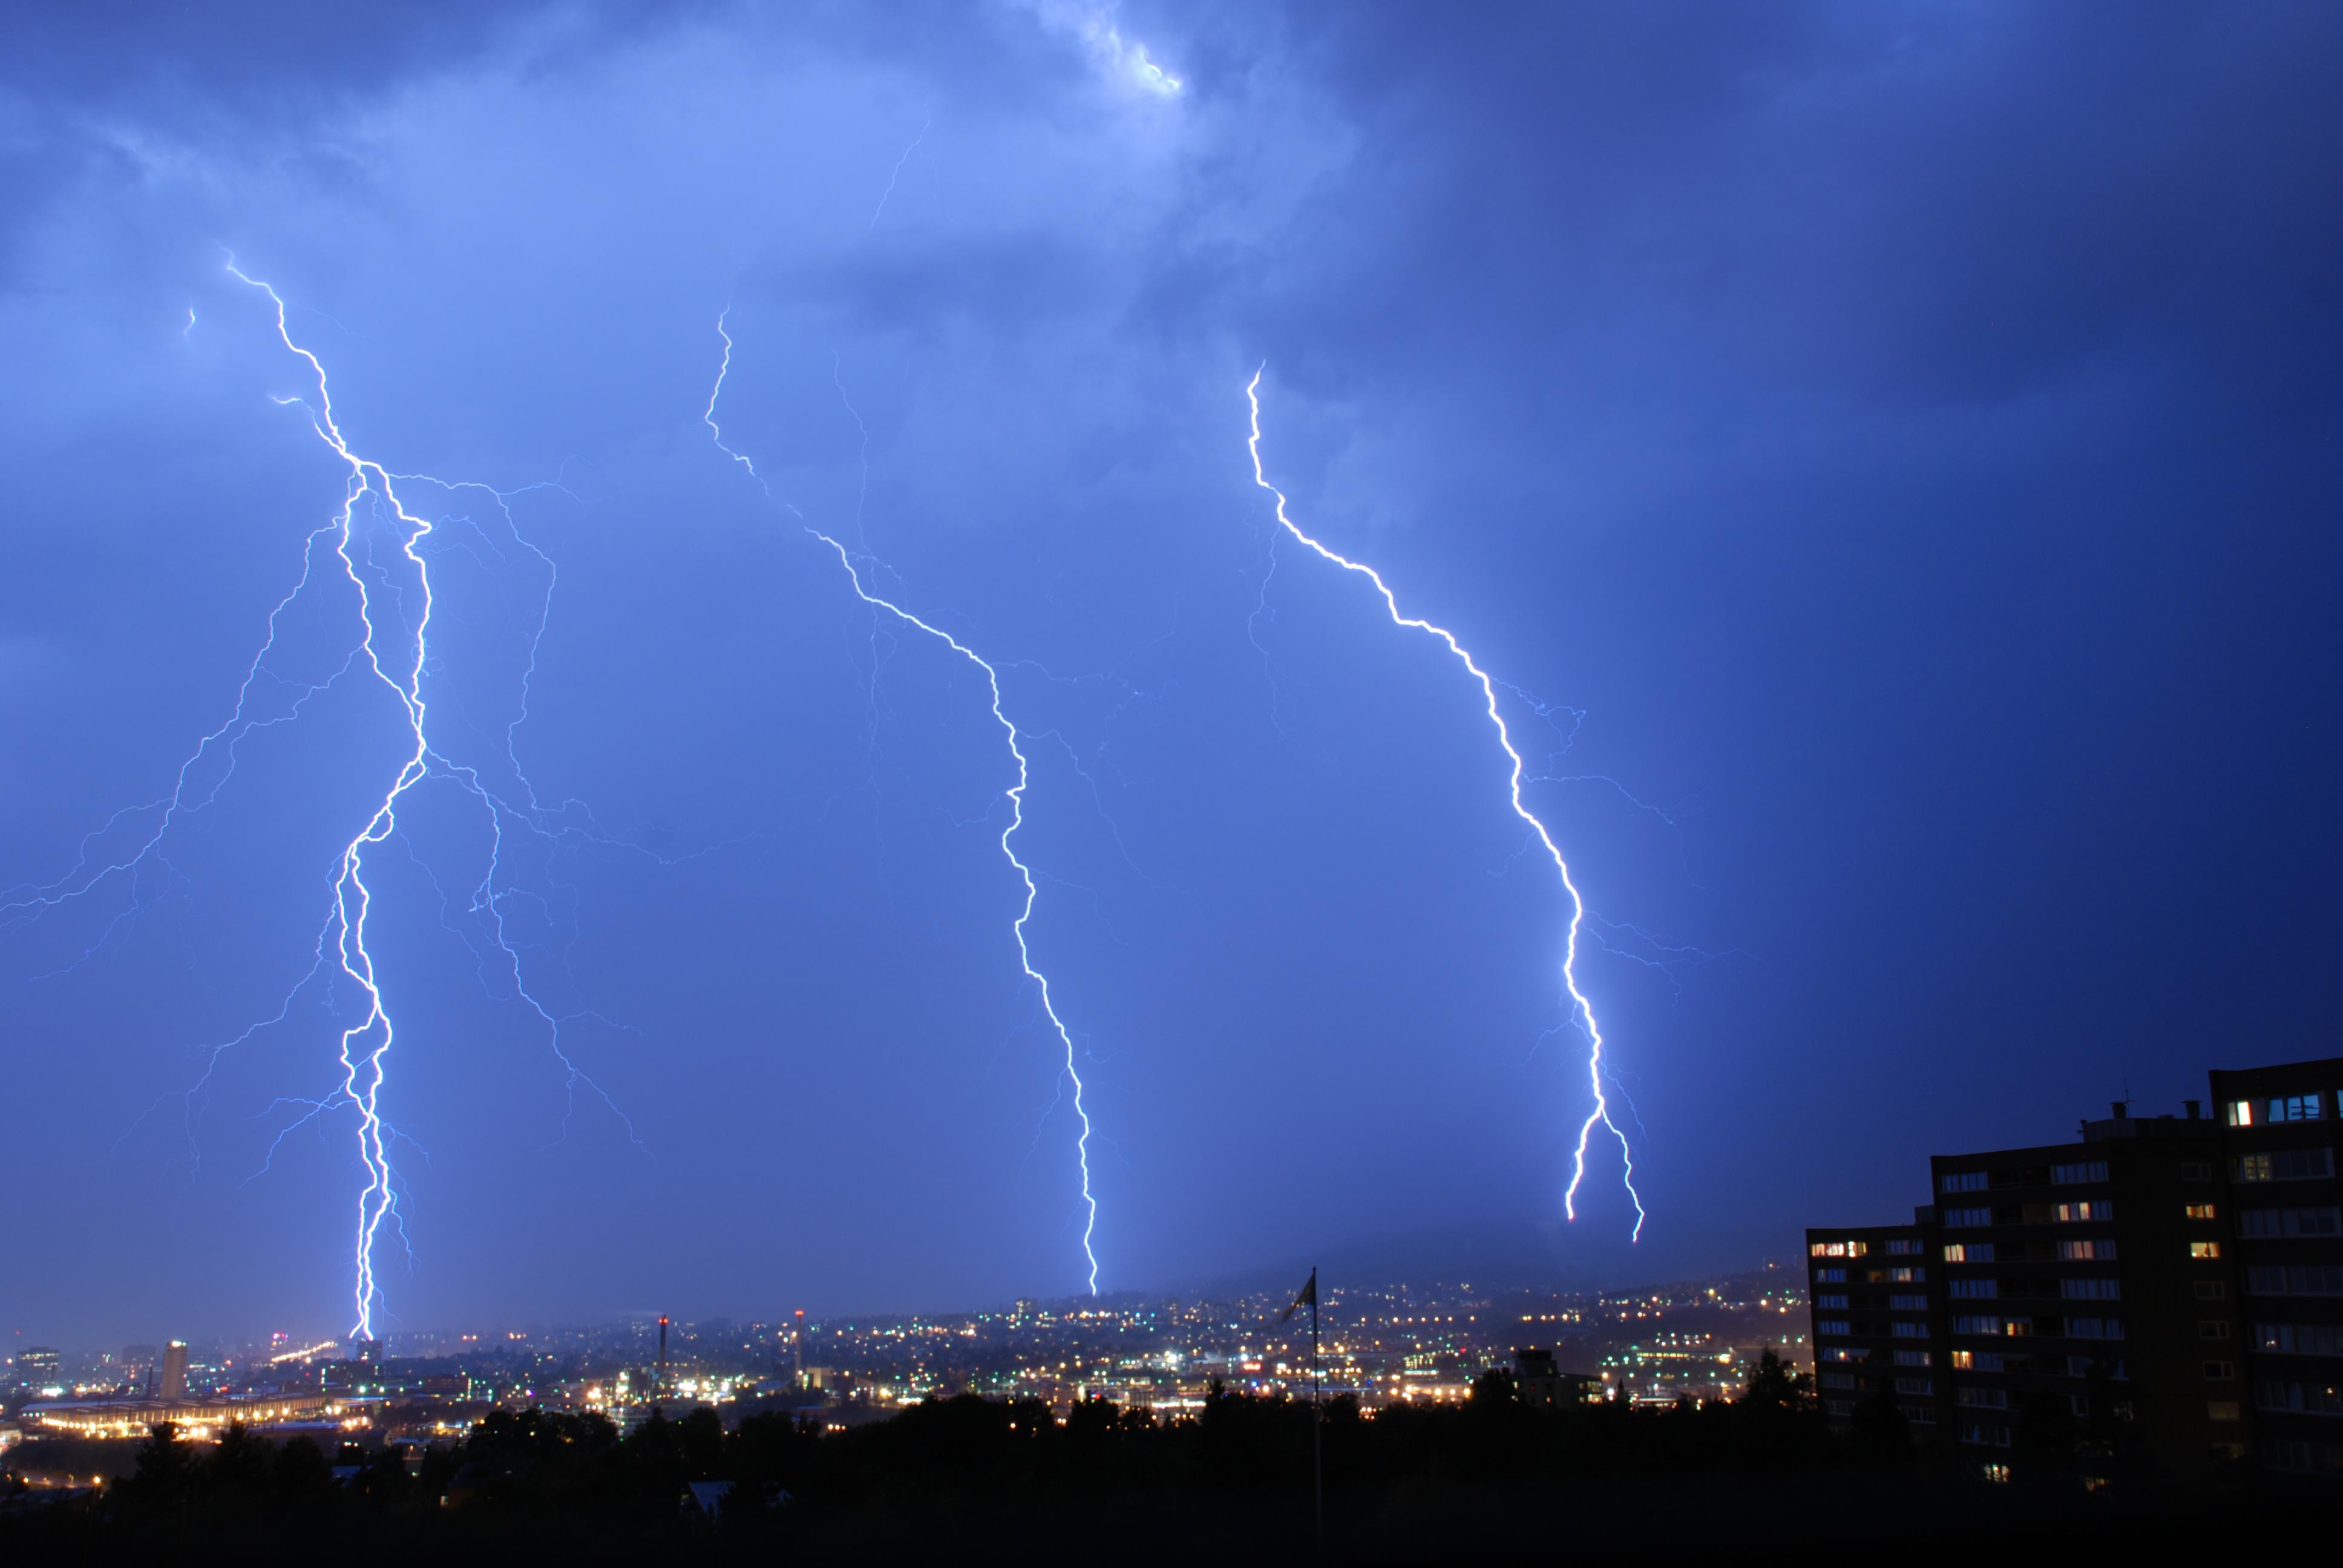 Lightning 4k ultra hd wallpaper background image 3872x2592 id 165994 wallpaper abyss - Lightning wallpaper 4k ...